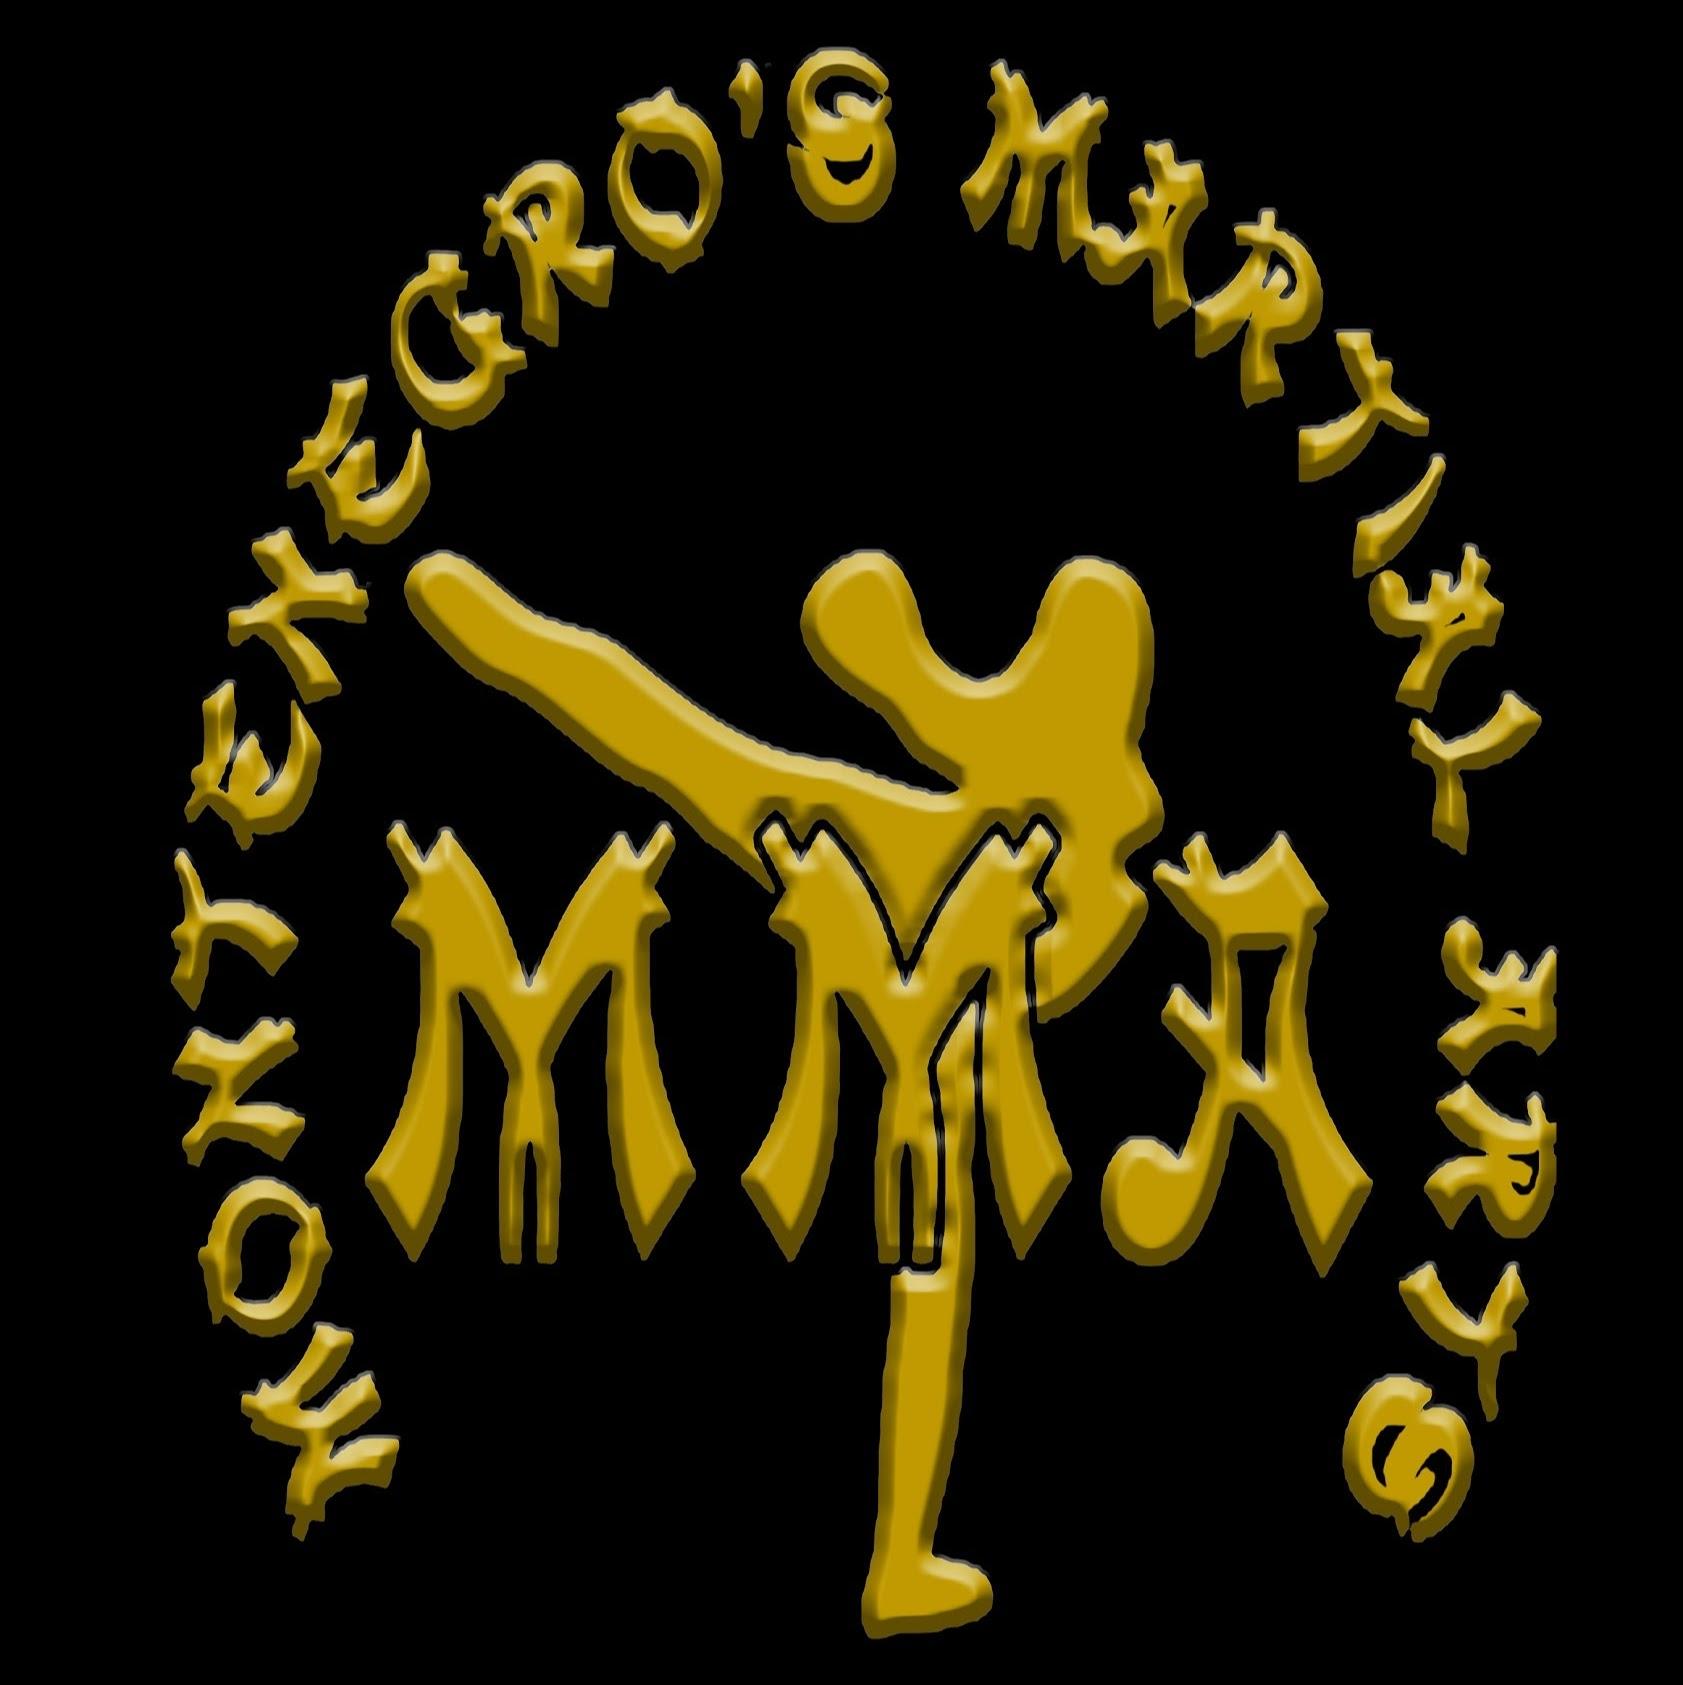 Montenegro's Martial Arts